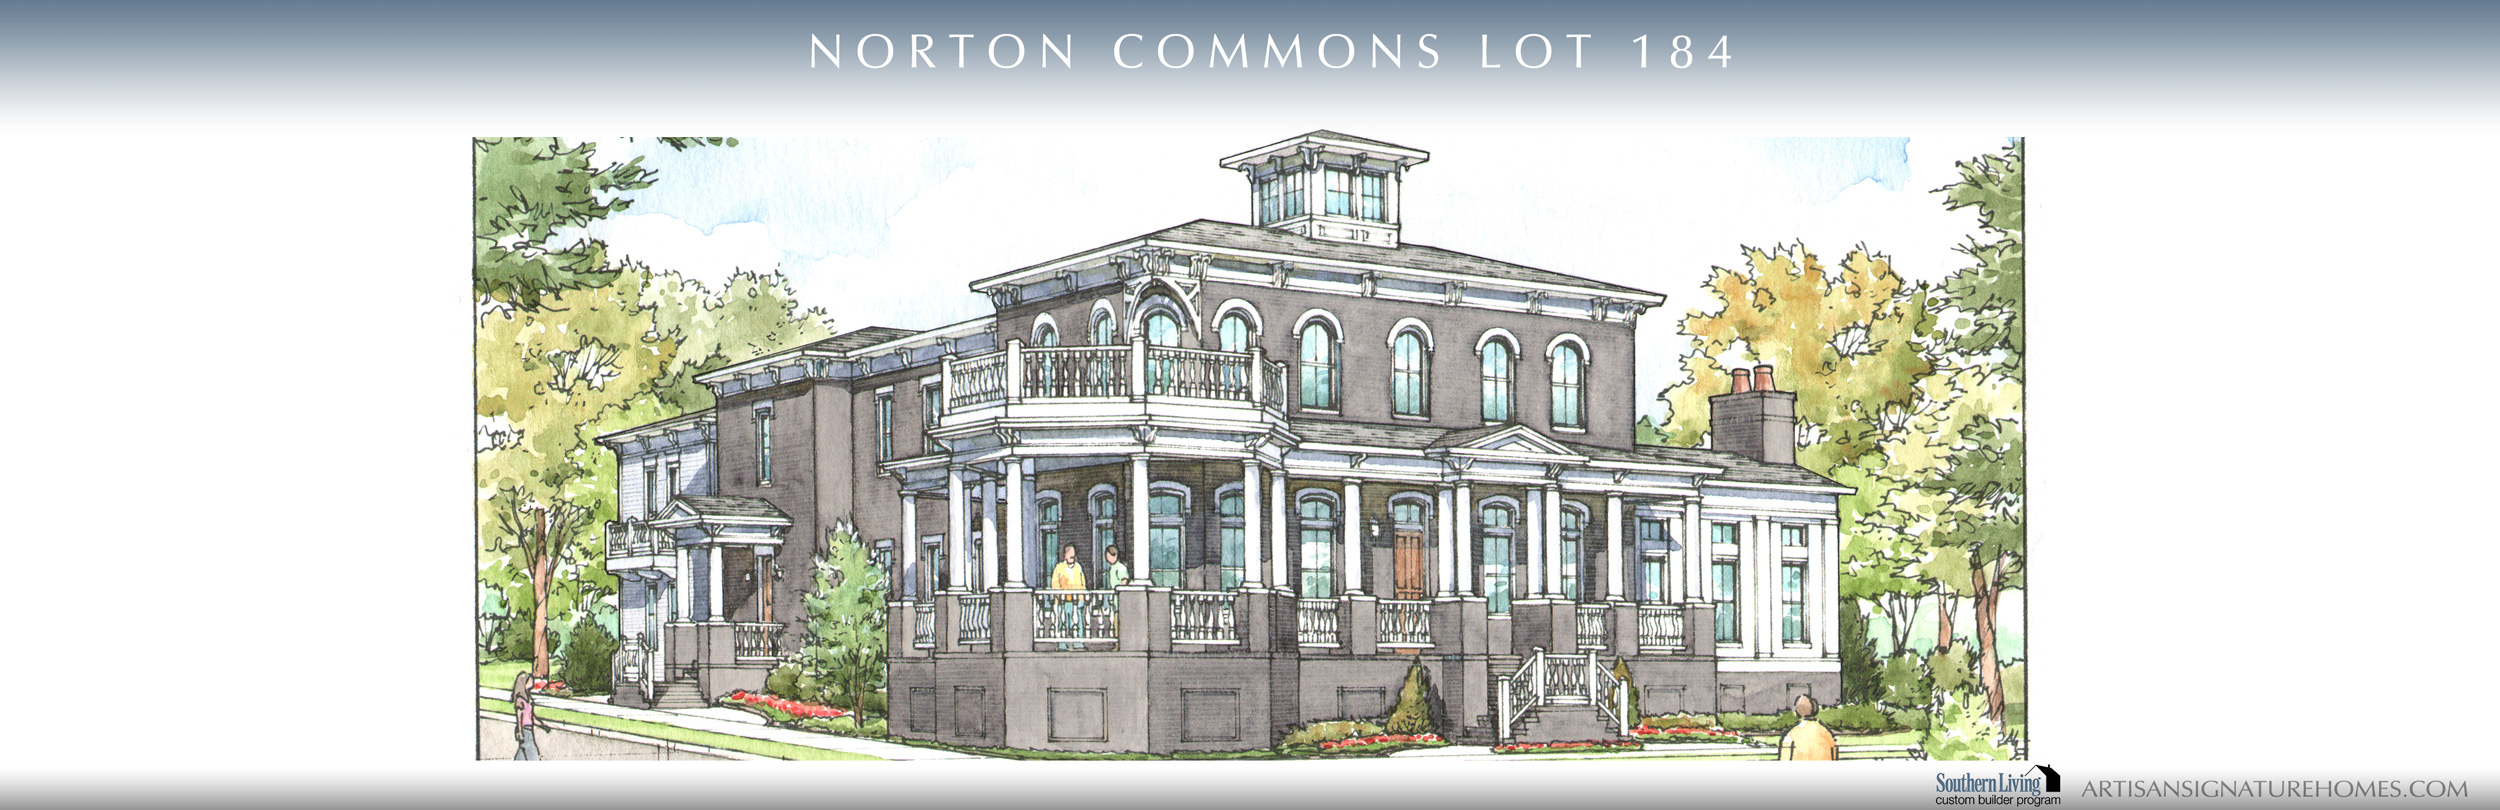 Artisan Signature Homes | Custom Home Builder | Louisville